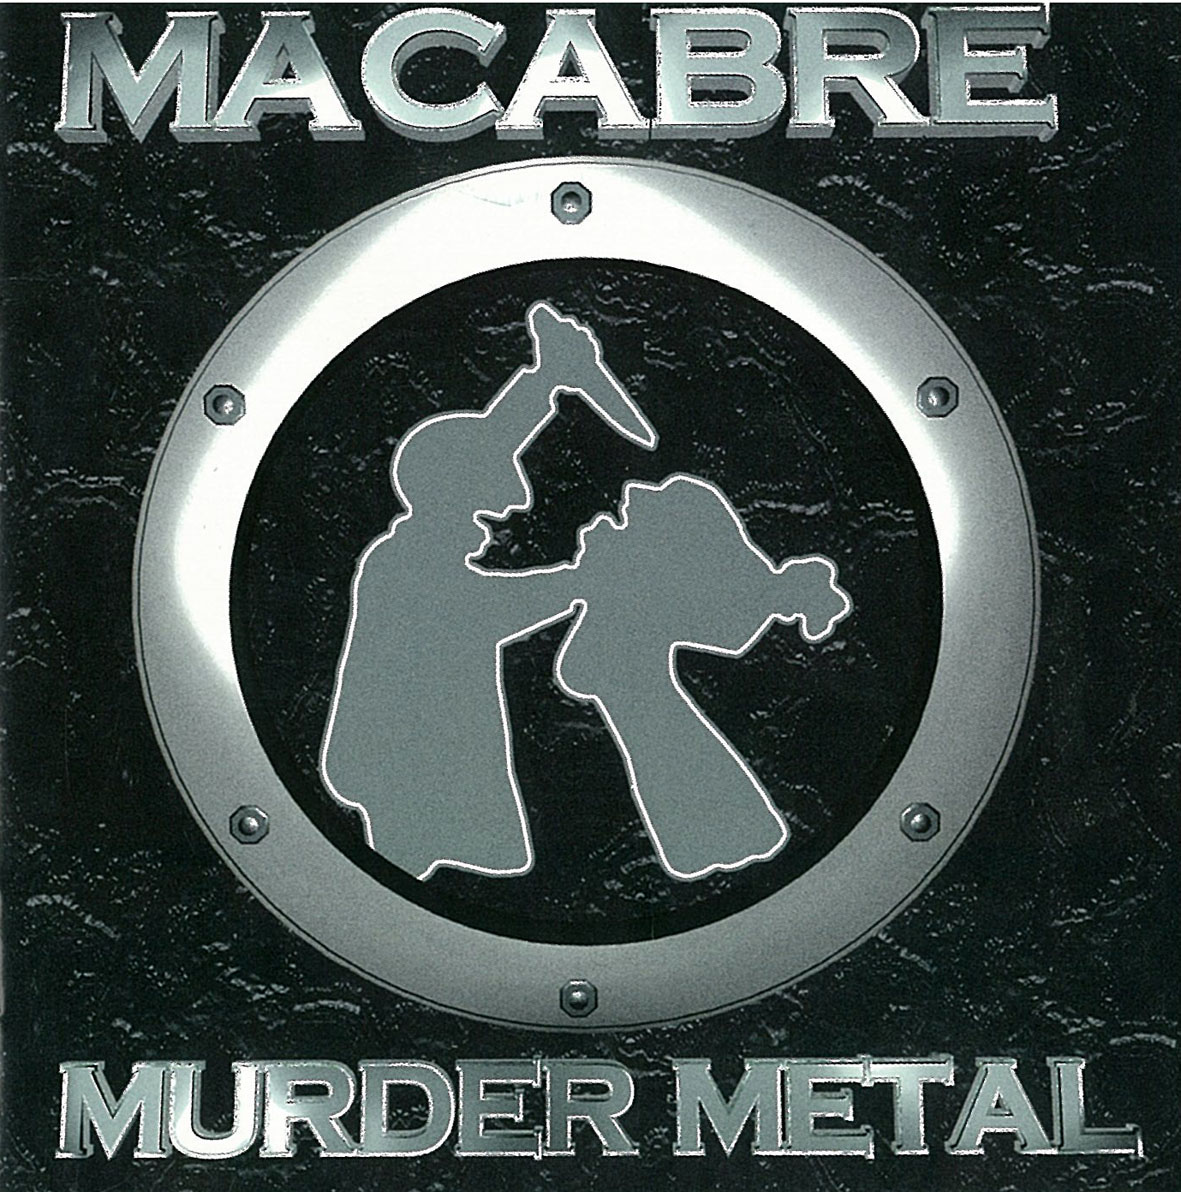 Macabre  Murder Metal